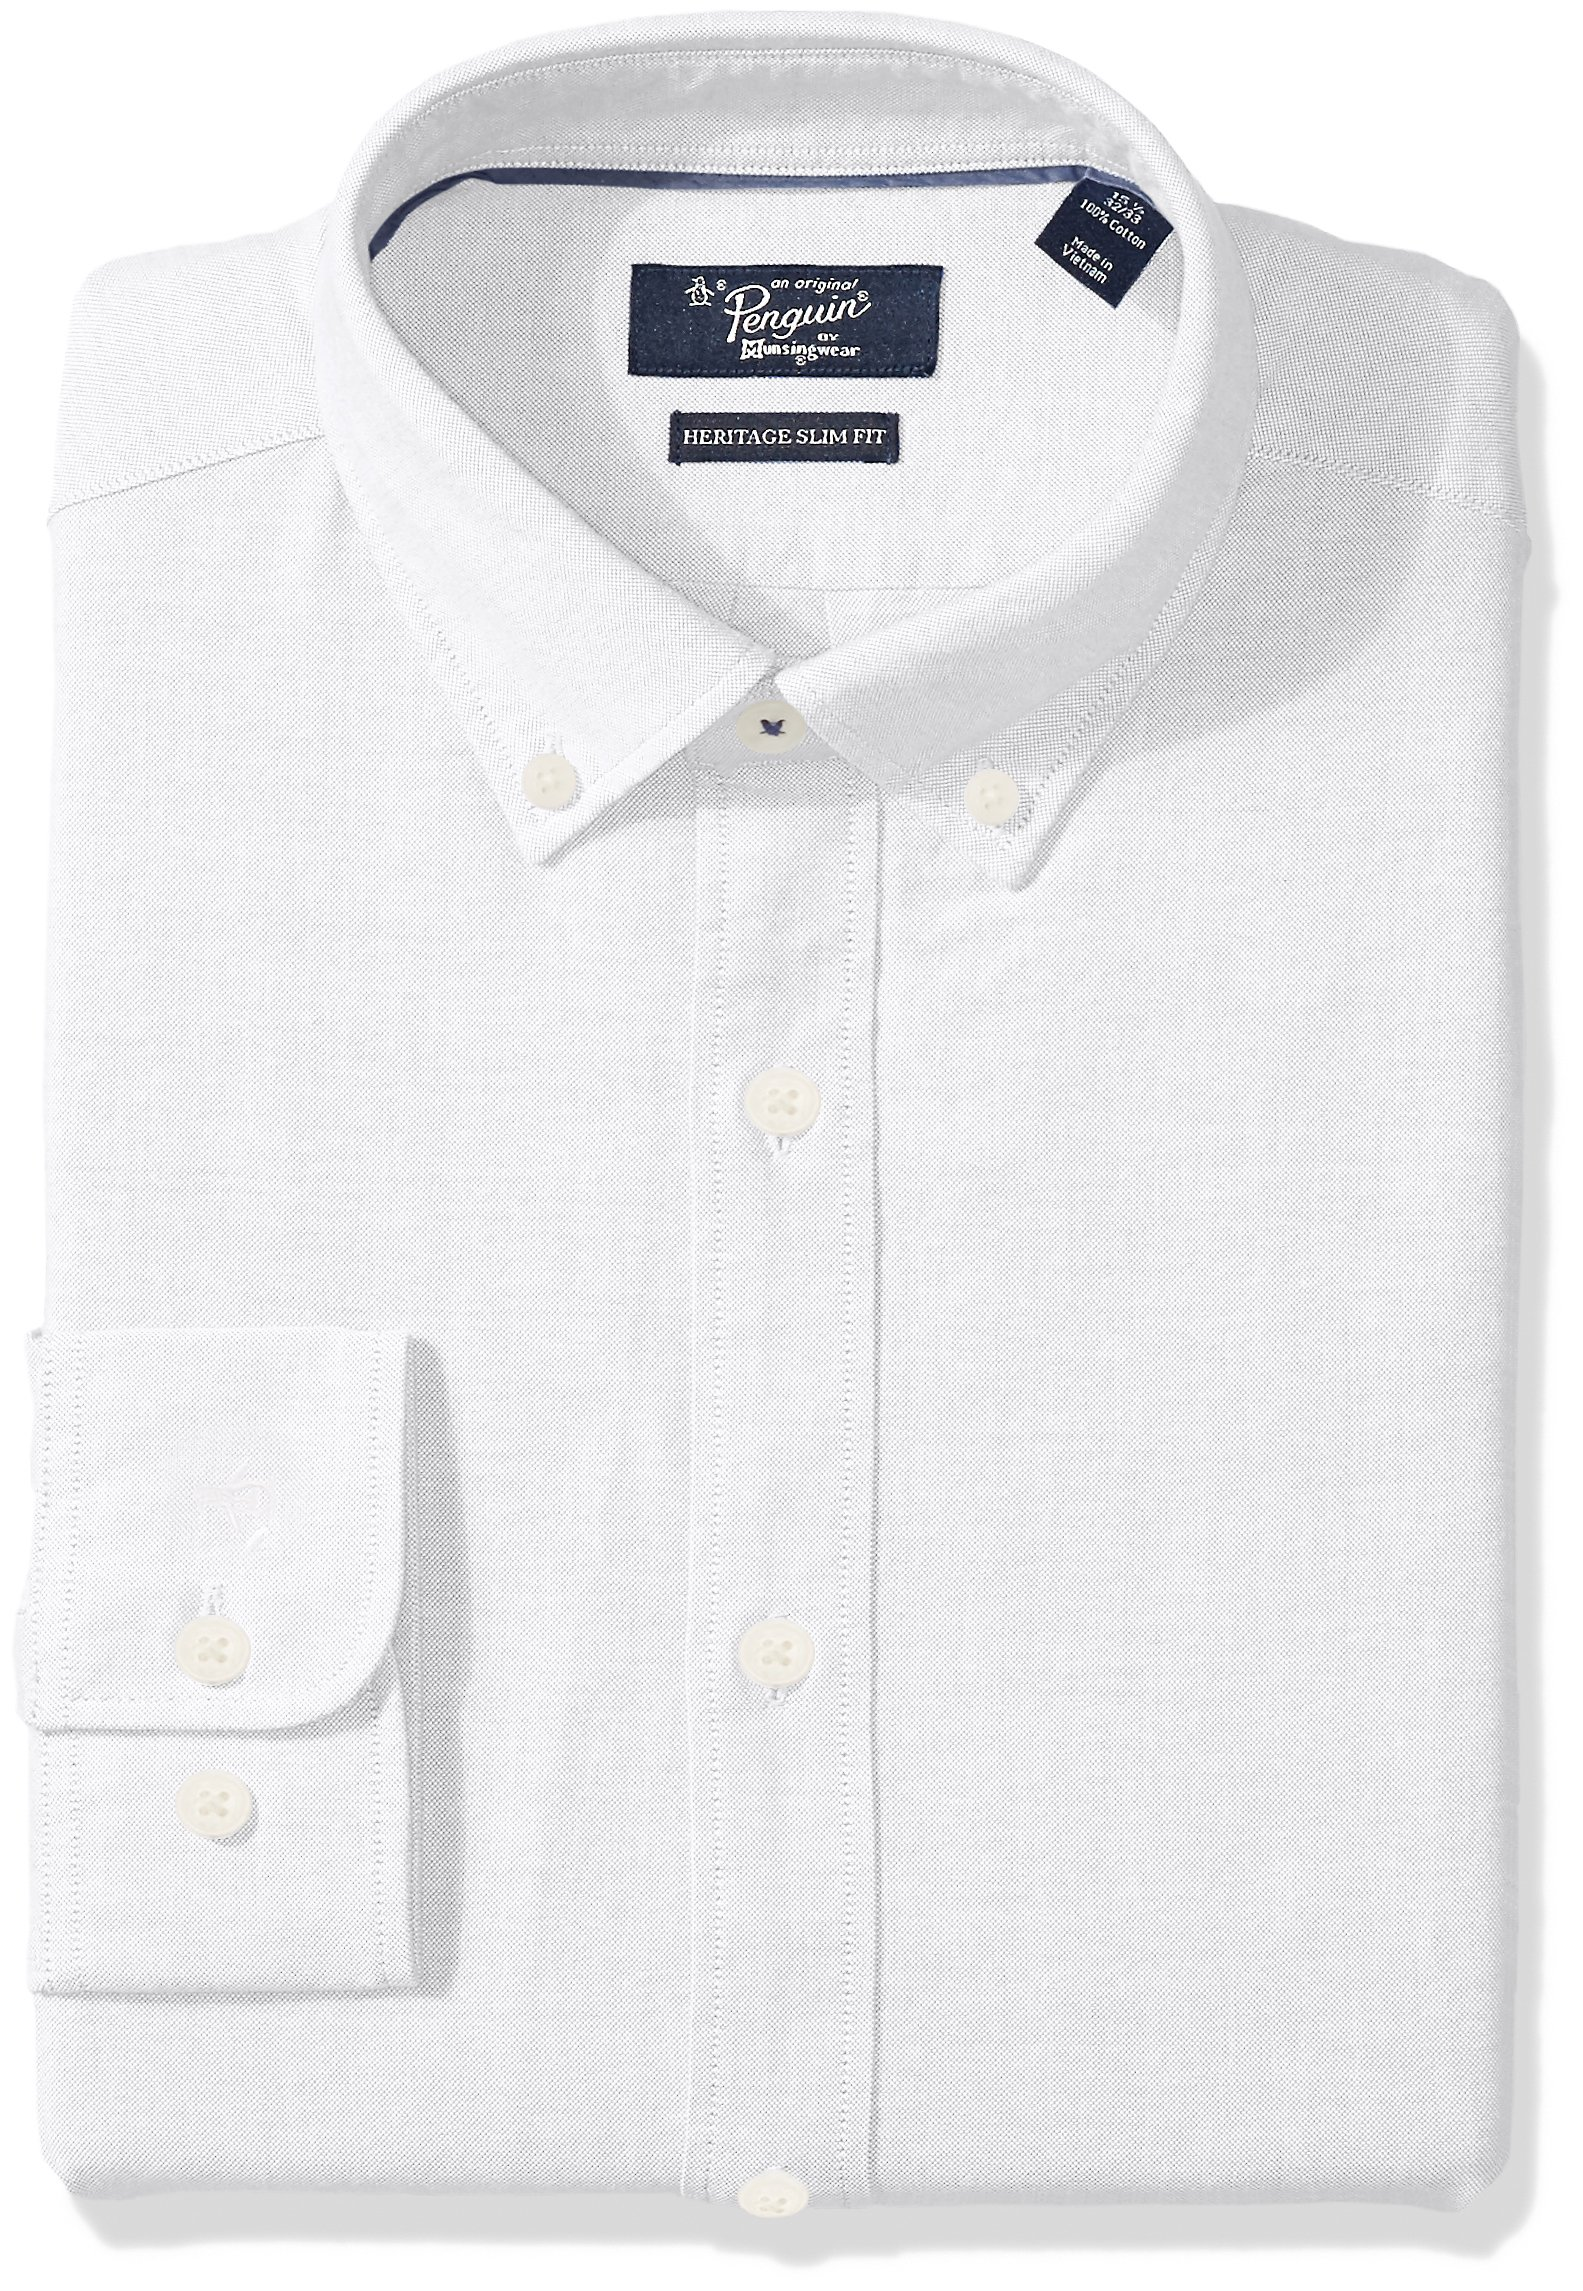 Original Penguin Men's Slim Fit Essential Dress Shirt, White Oxford, 16'' Neck 32''-33'' Sleeve